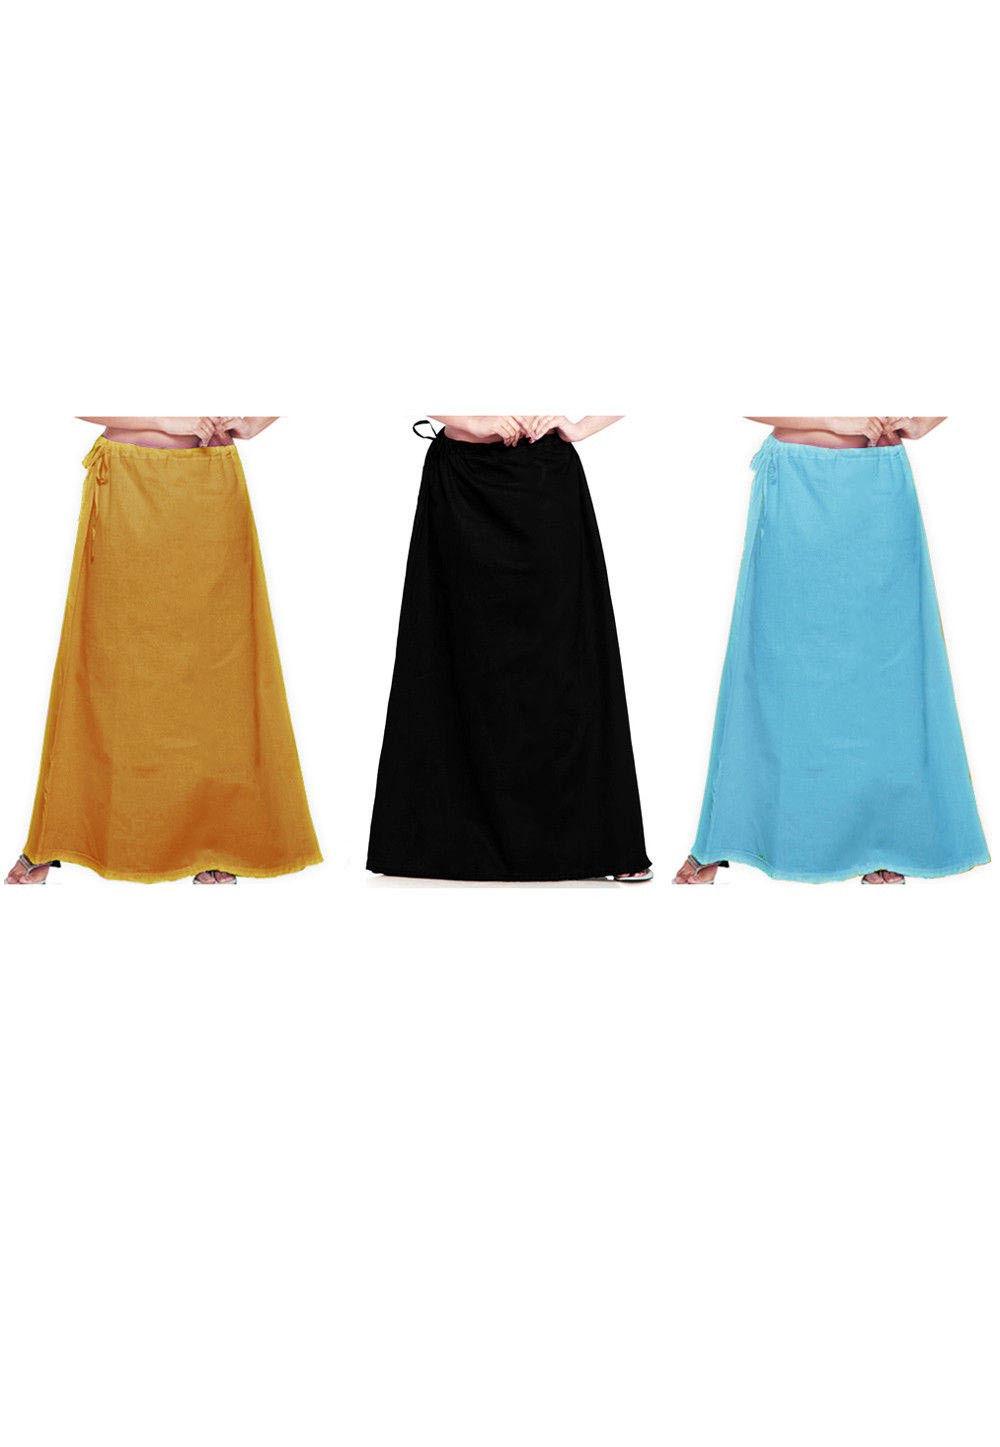 Combo Set Cotton Petticoat in Mustard, Black and Sky Blue